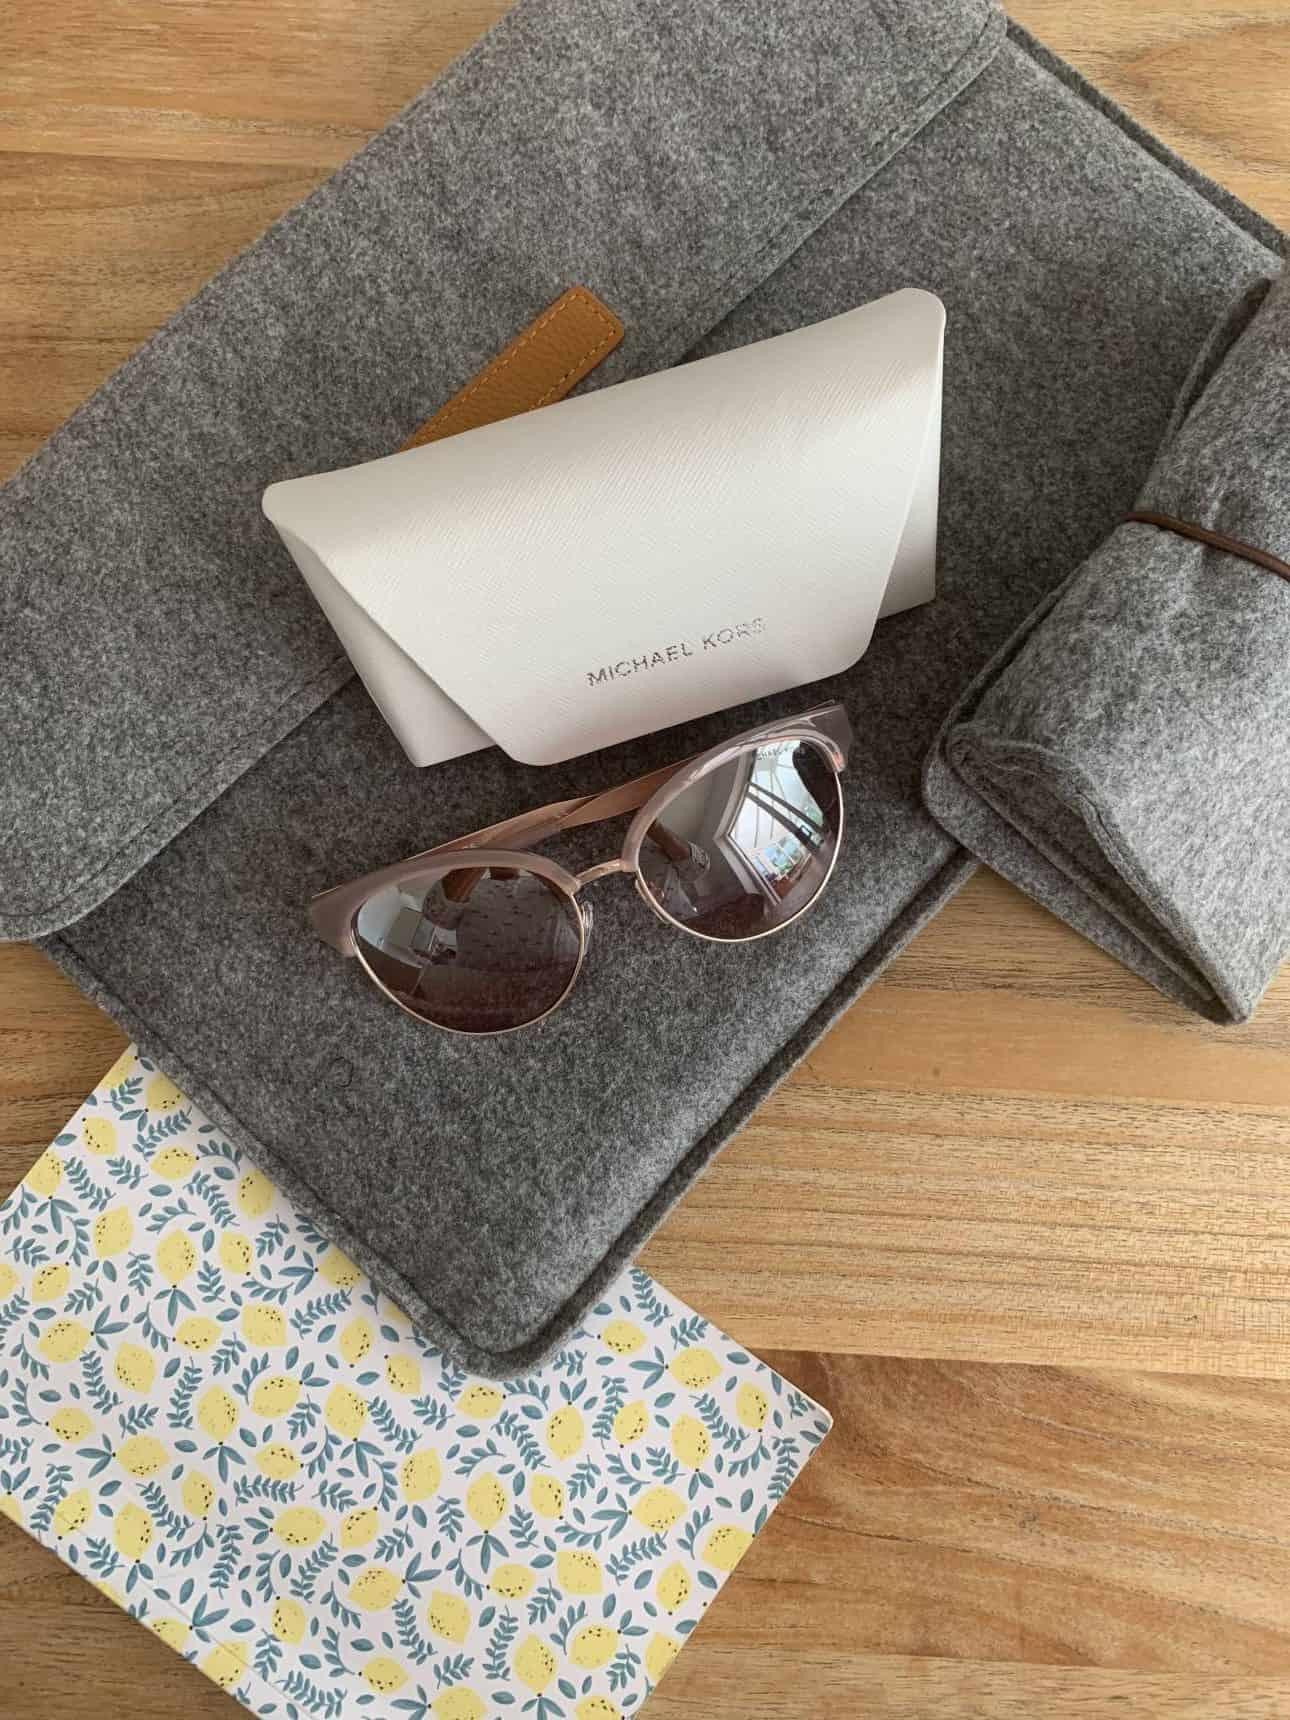 Micheal Kors Amalfi Sunglasses